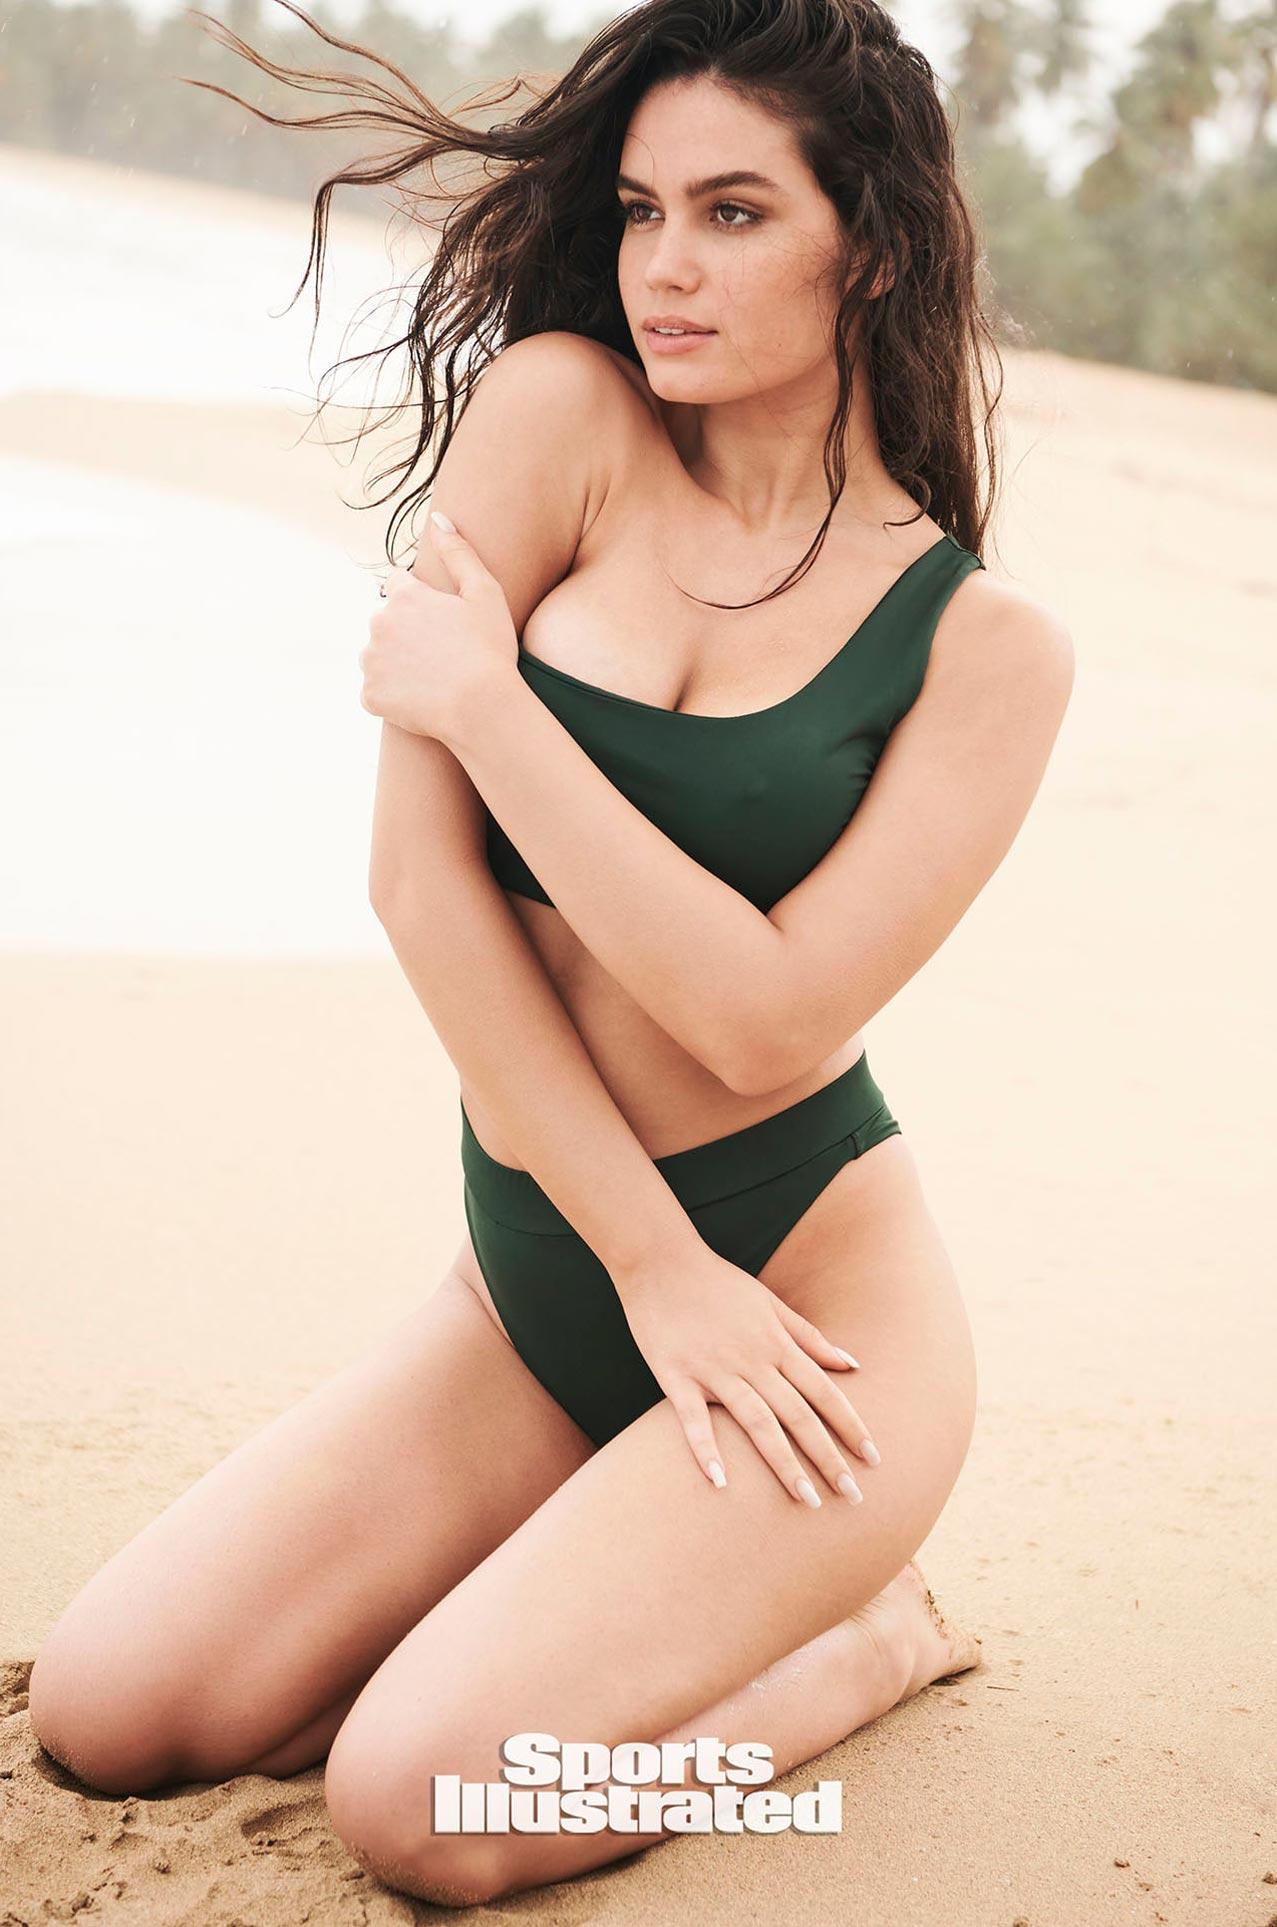 Энн де Паула в каталоге купальников Sports Illustrated Swimsuit 2020 / фото 11